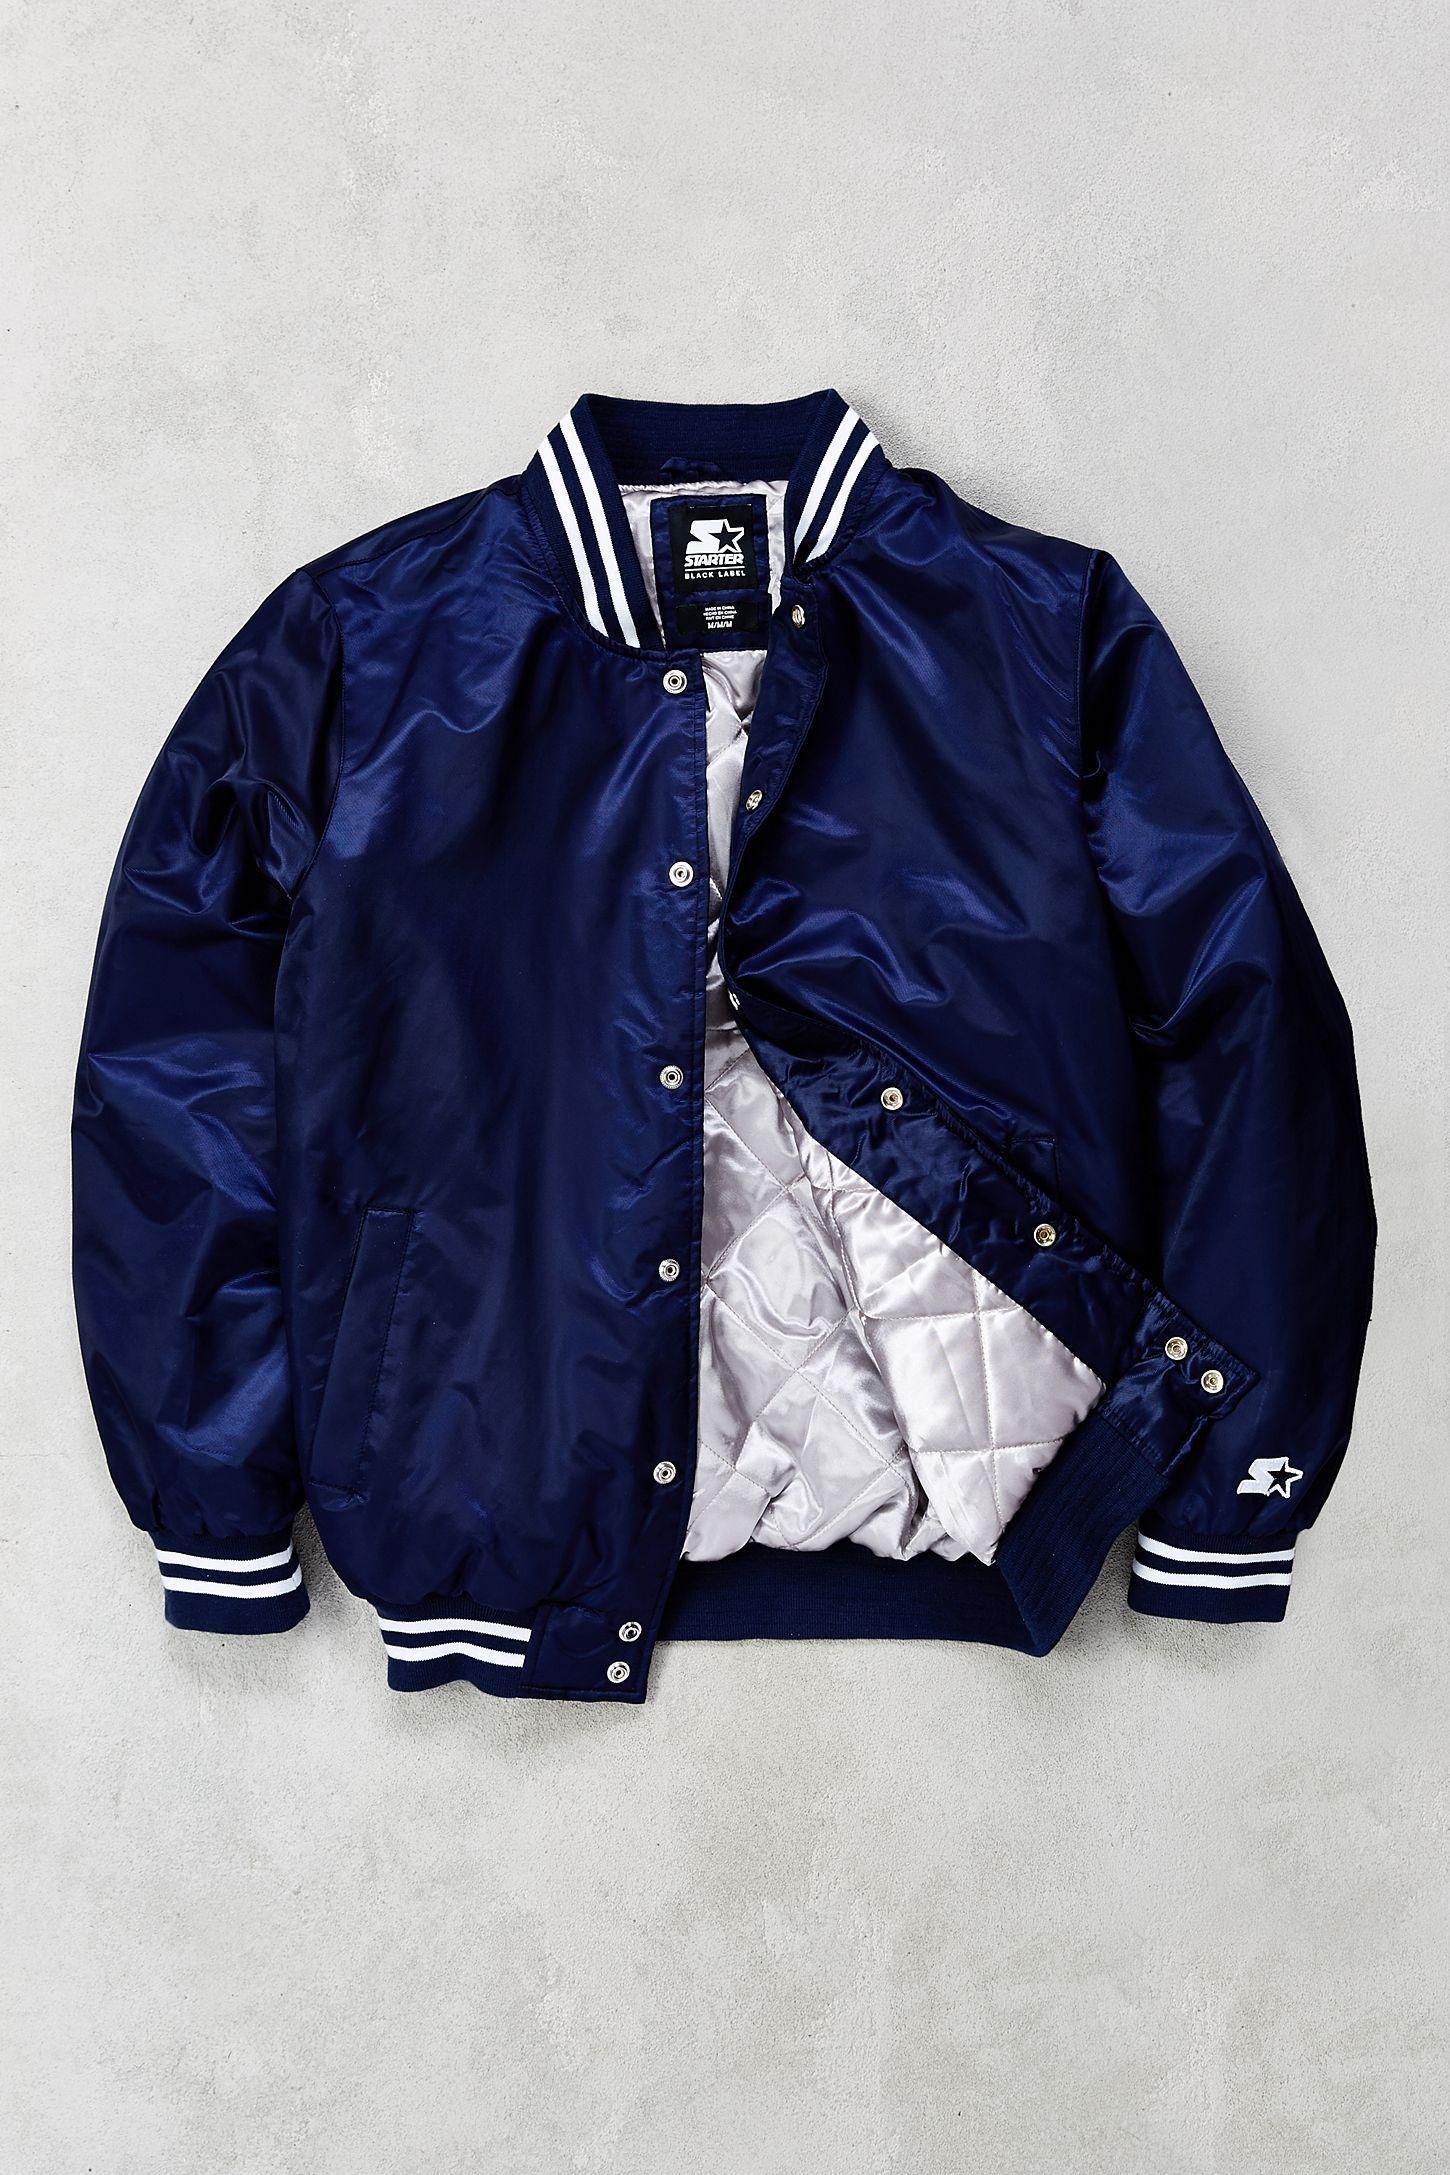 Starter Black Label Hooded Varsity Jacket Varsity Jacket Men Varsity Jacket Outfit Urban Jacket